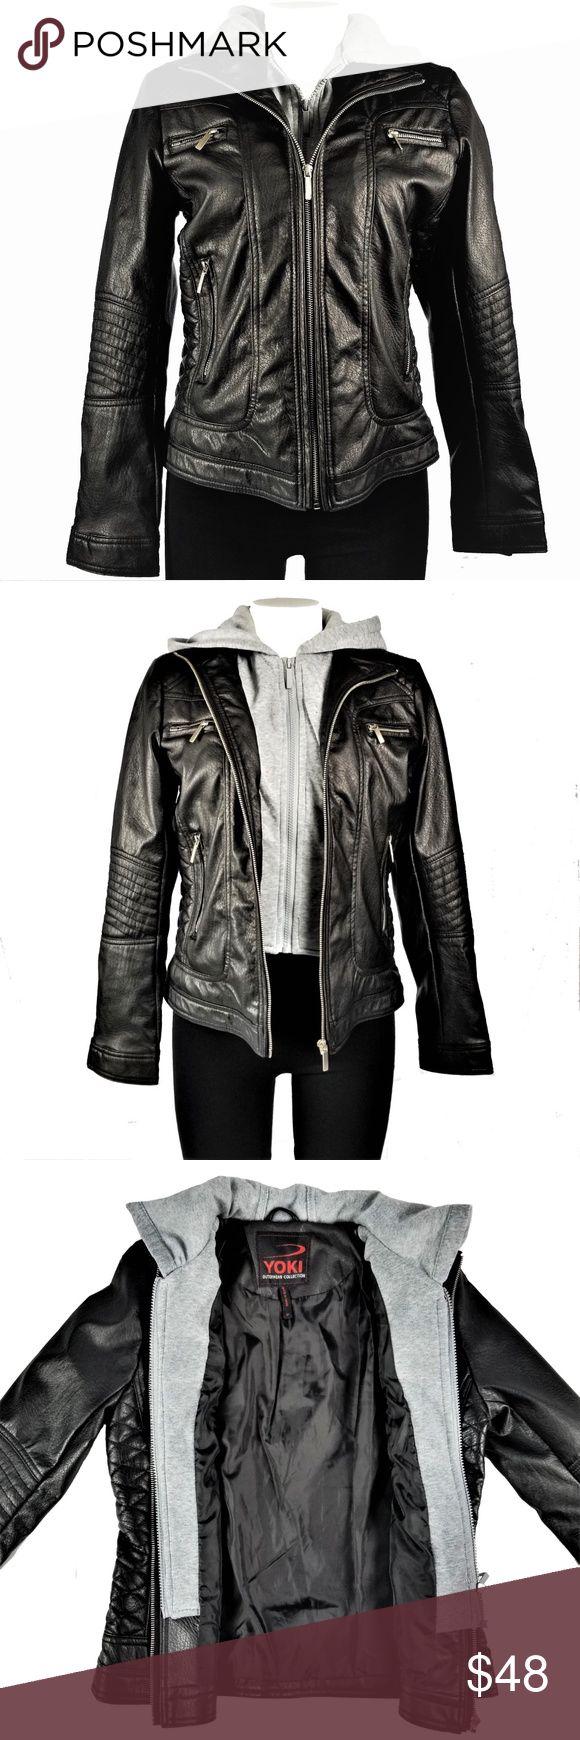 Yoki Outerwear Collection Moto Jacket Layered Black Faux Leather Jacket Yoki Jackets [ 1740 x 580 Pixel ]